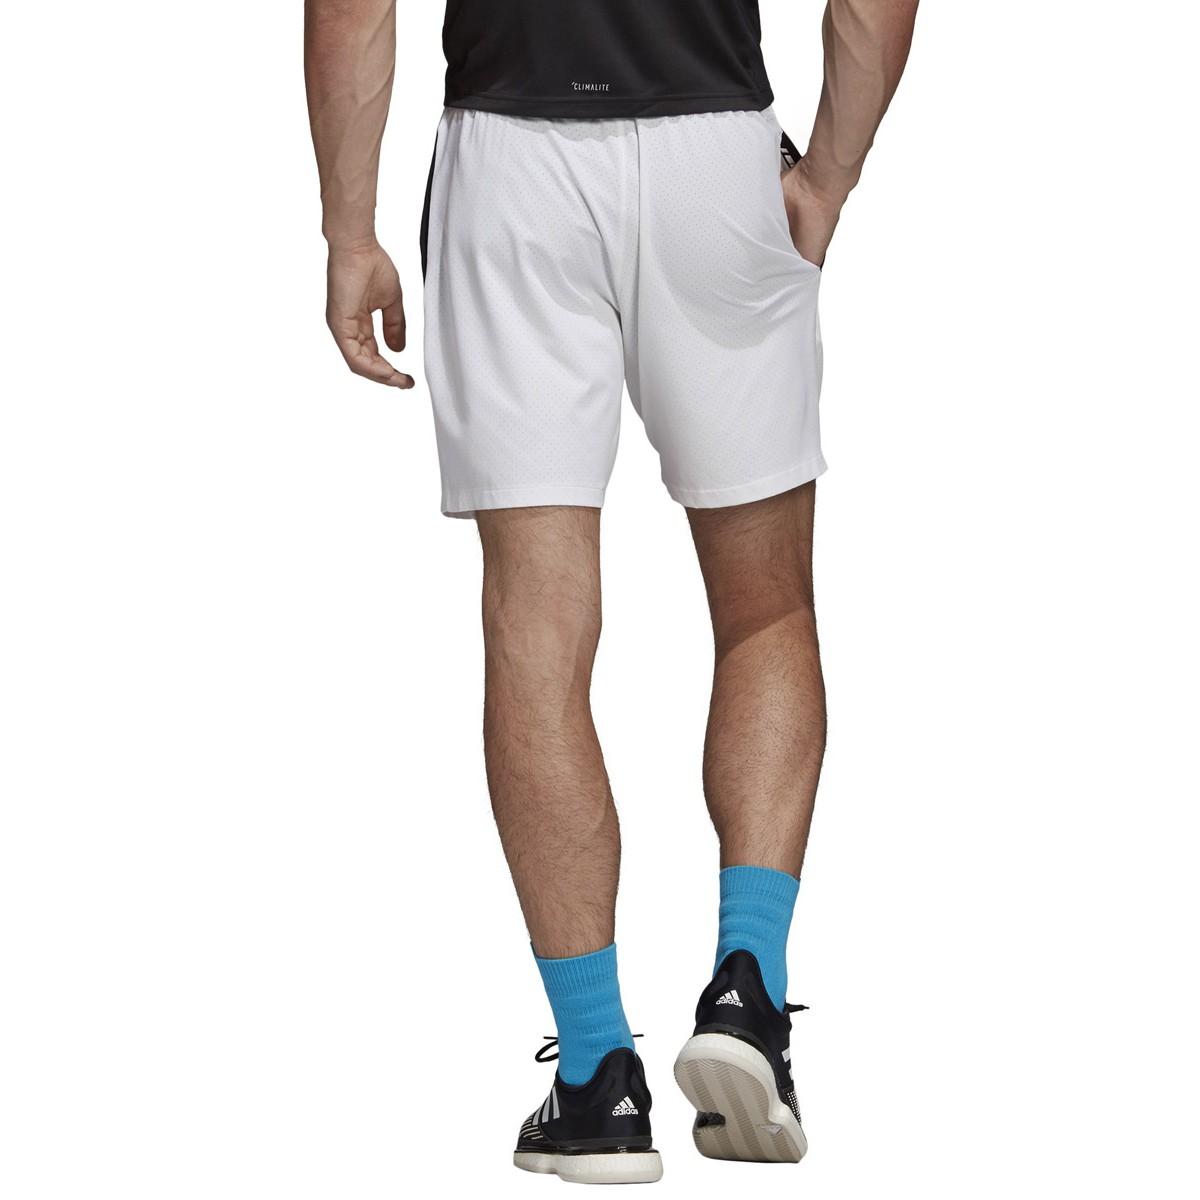 Homme Escouade VêtementsTennispro Adidas Short Short Adidas Escouade UqMGzSVp